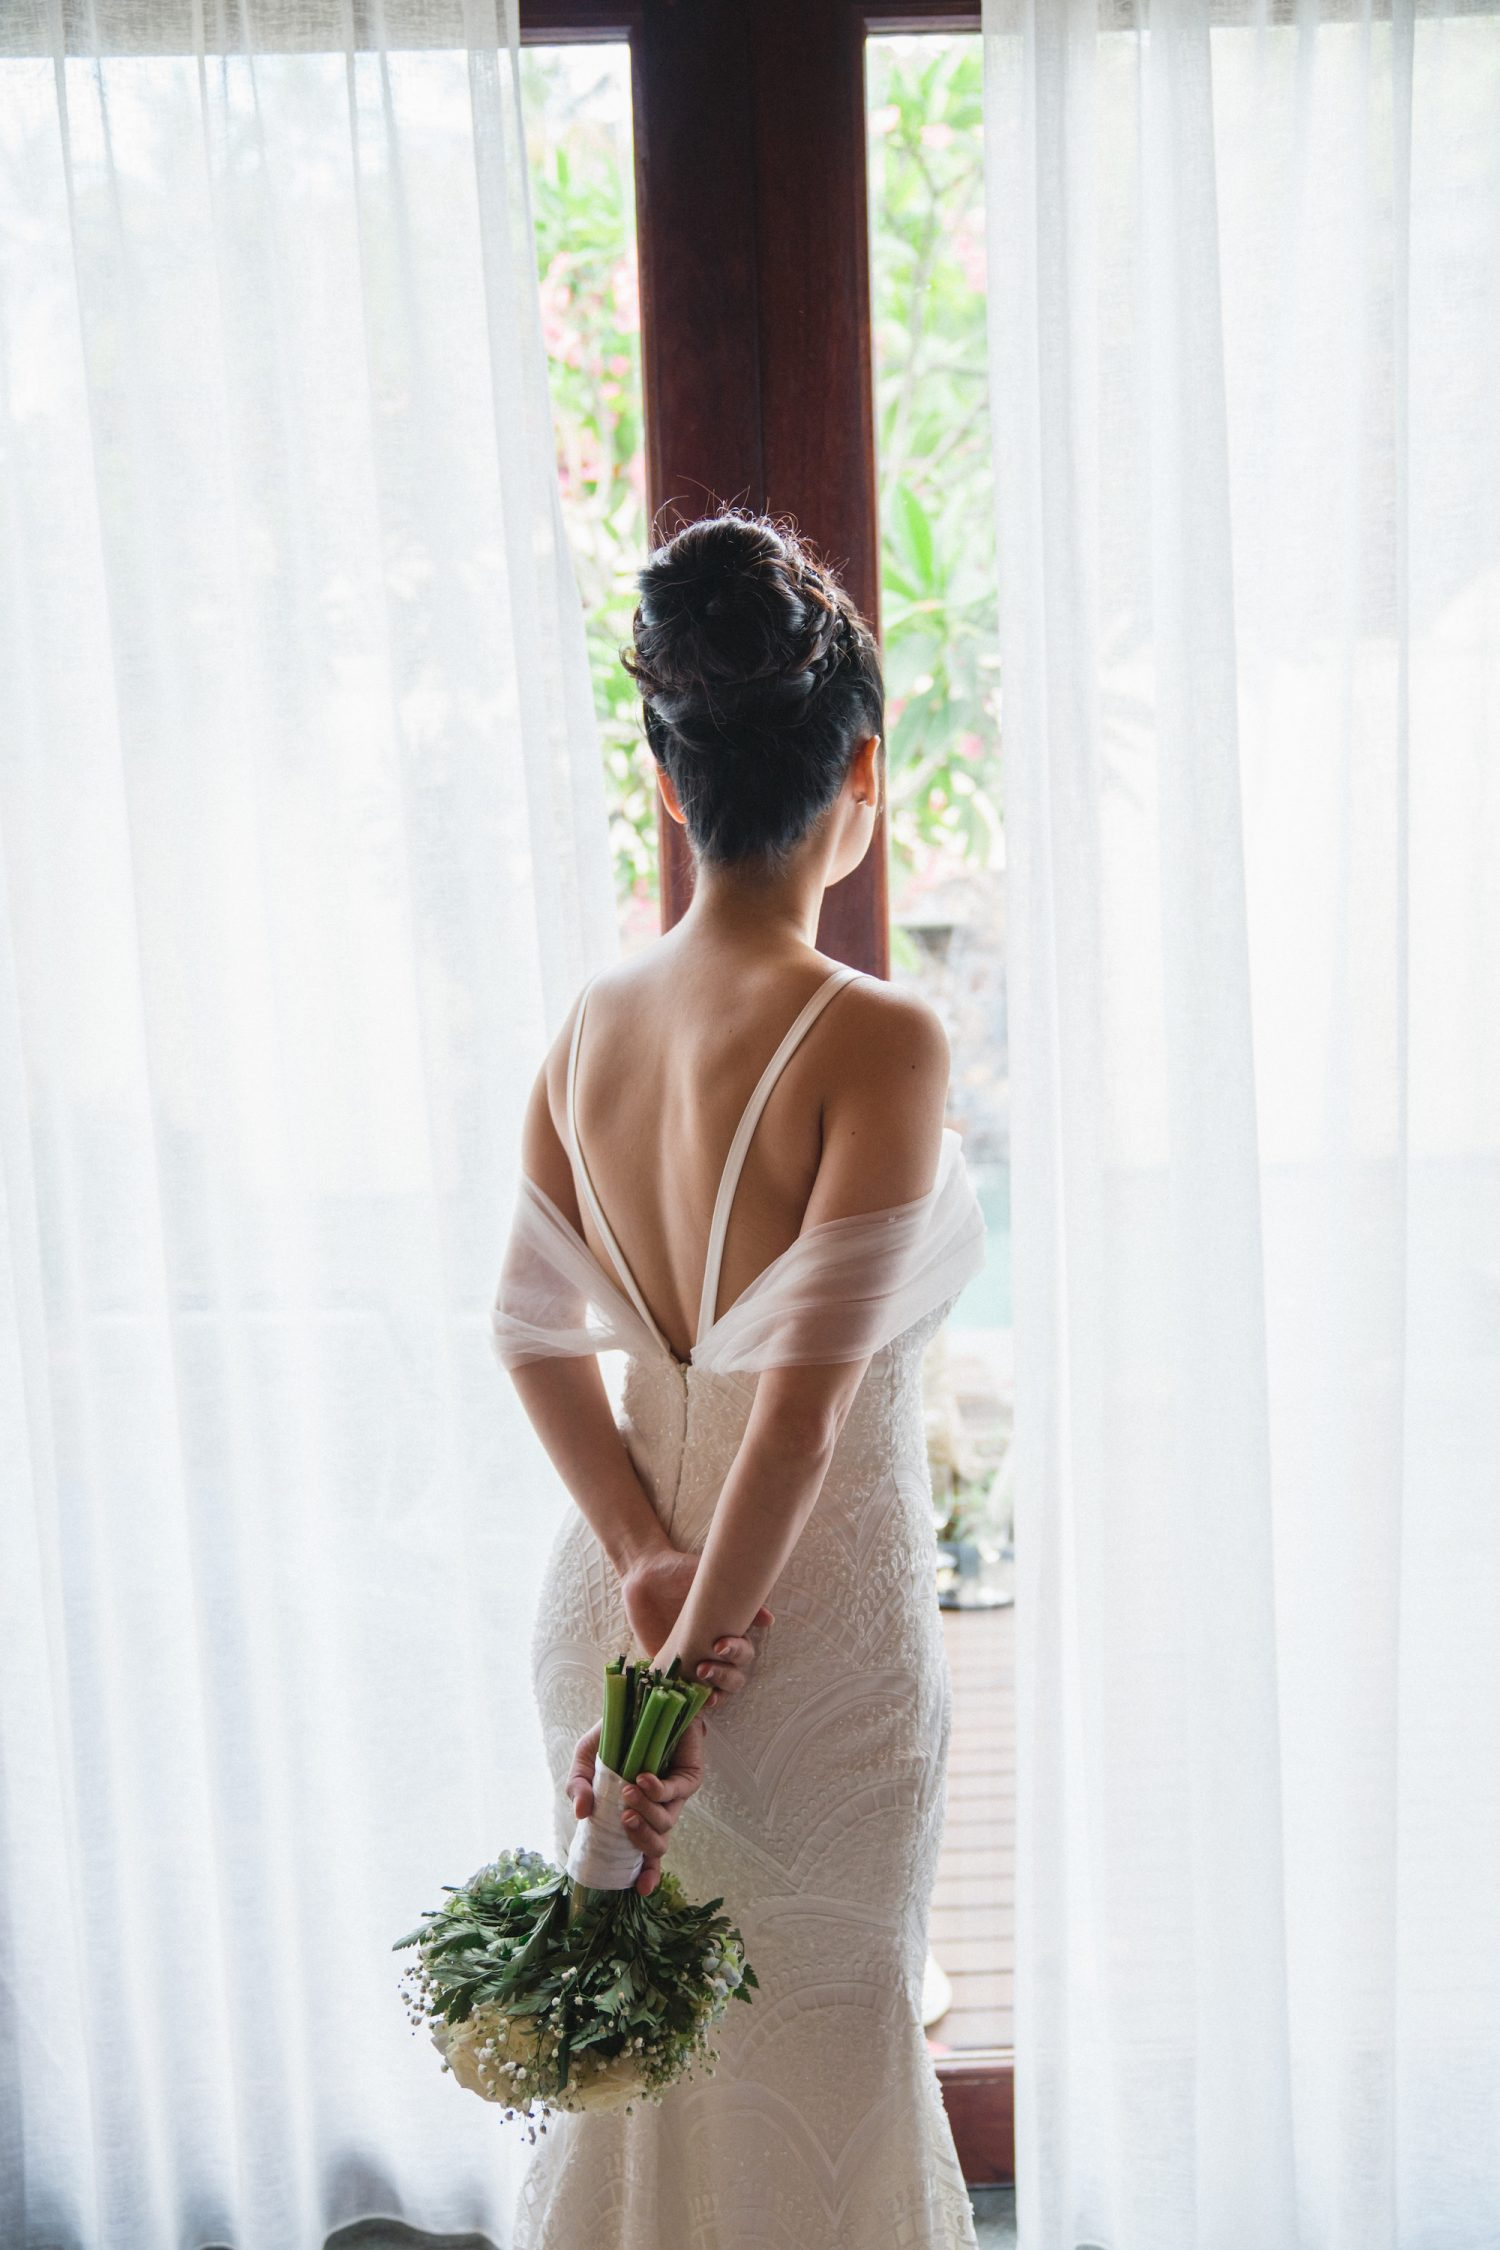 Custom wedding dresses designed in Singapore | LIILOODESIGNS